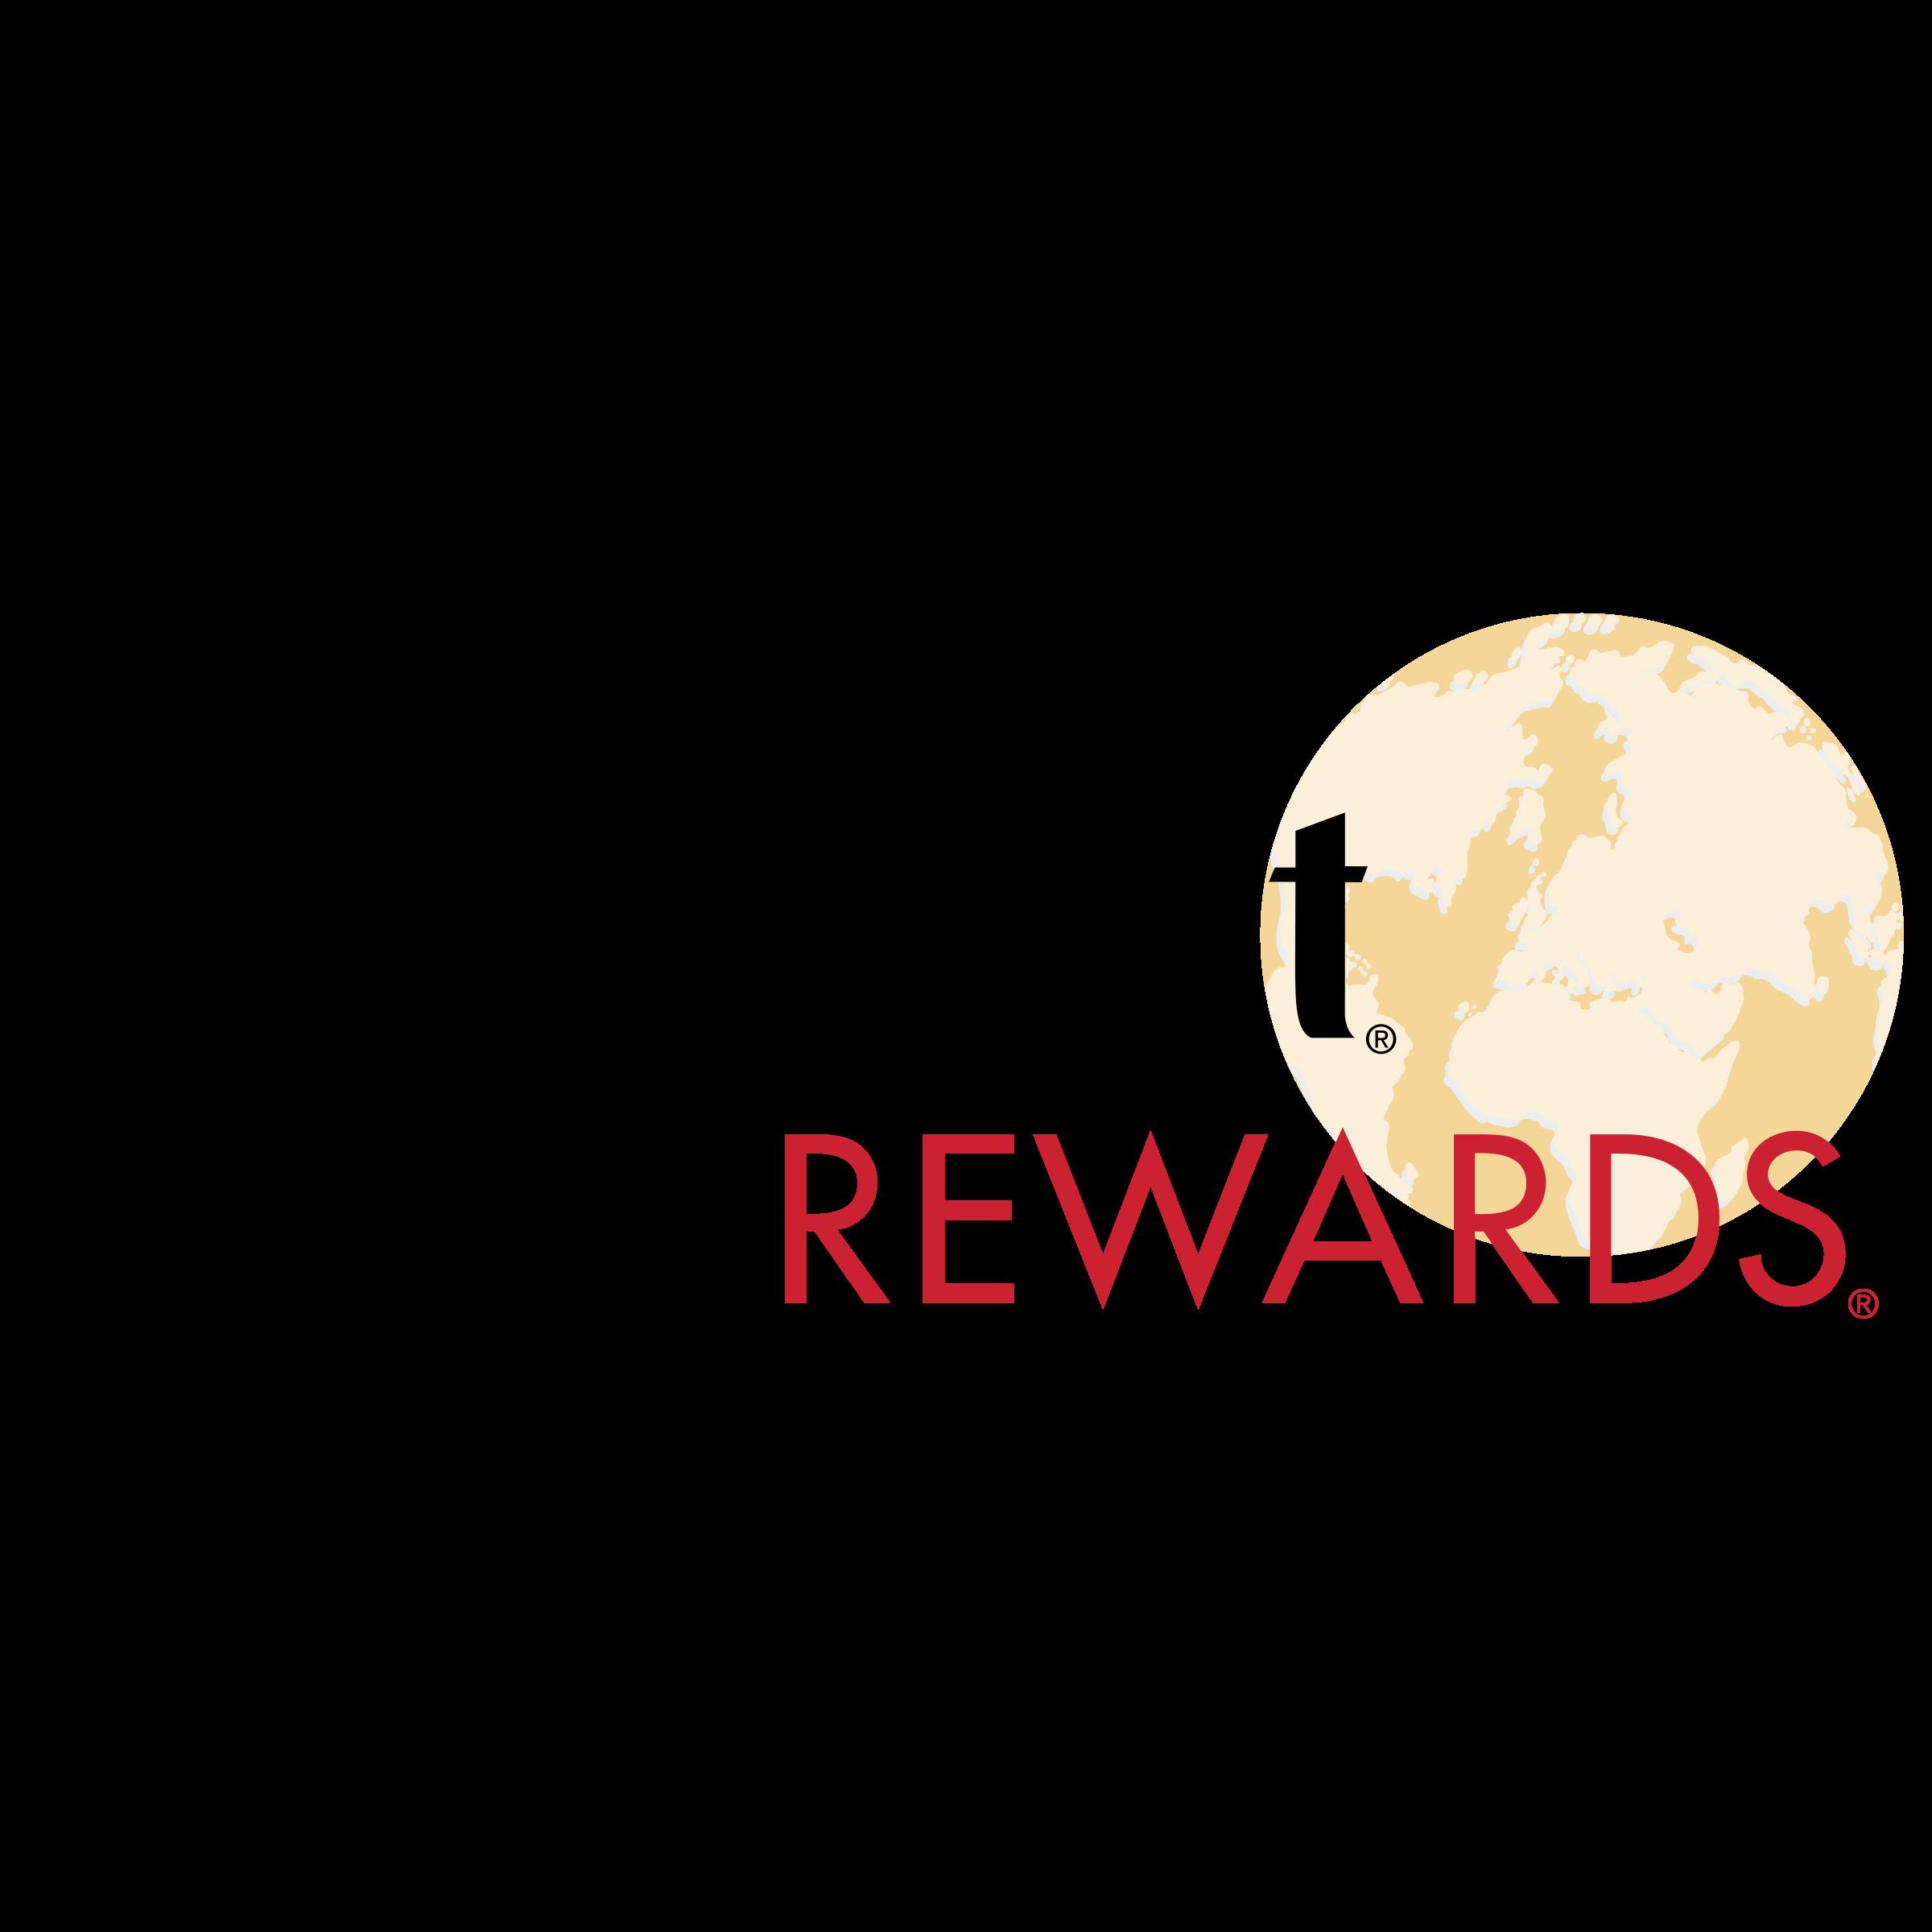 Marriott Rewards Logo PNG Transparent & SVG Vector.